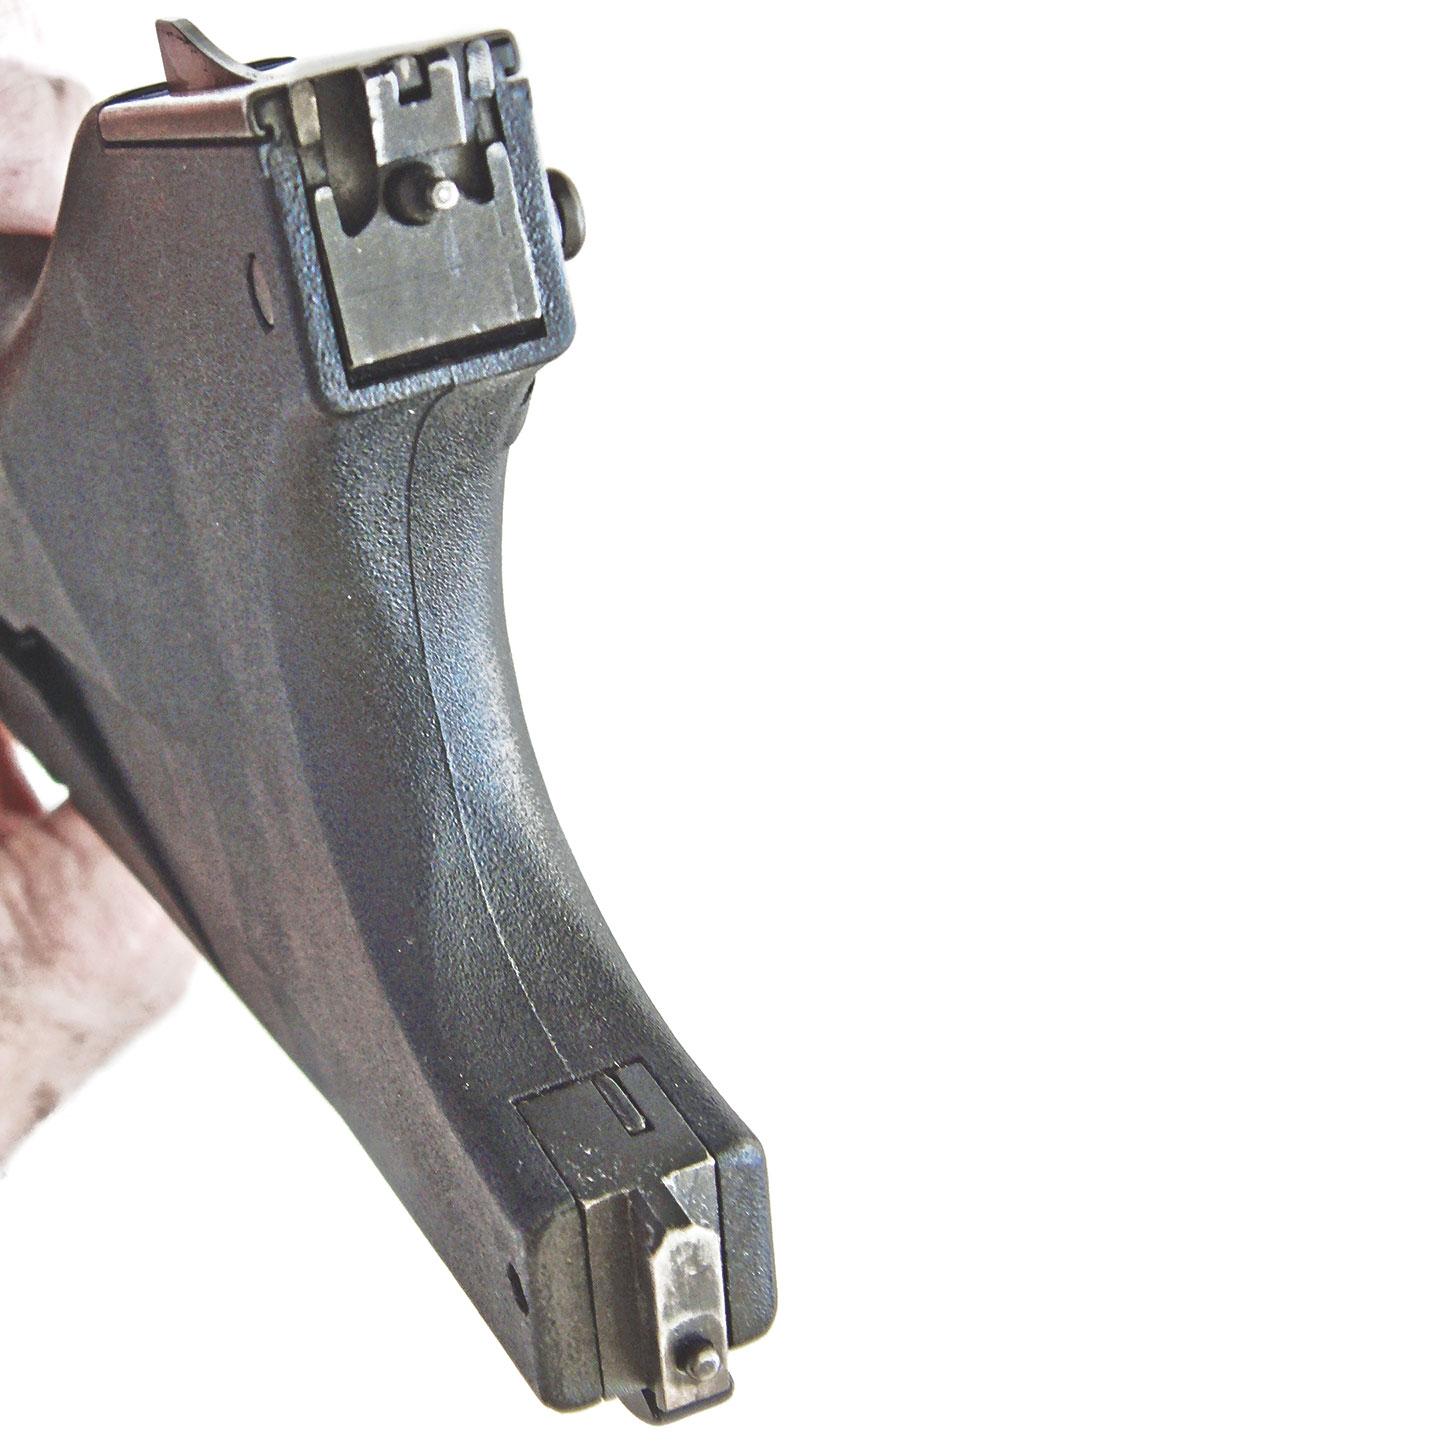 HK-VP70-Machine-Pistol-8